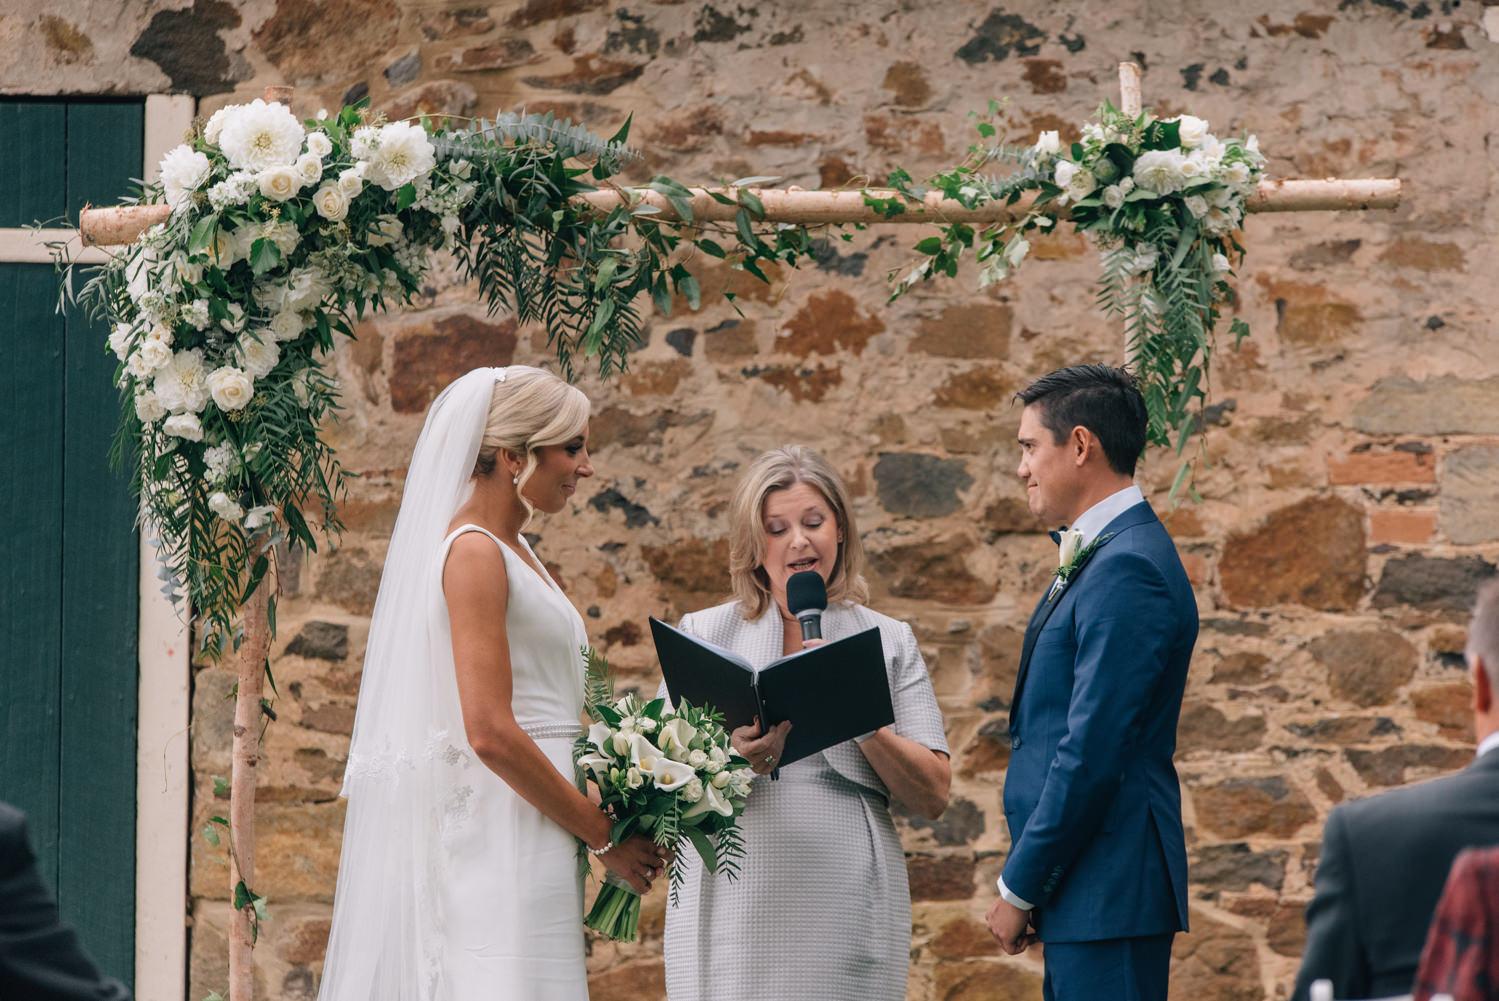 Entally-House-Wedding-Photographer-50.jpg